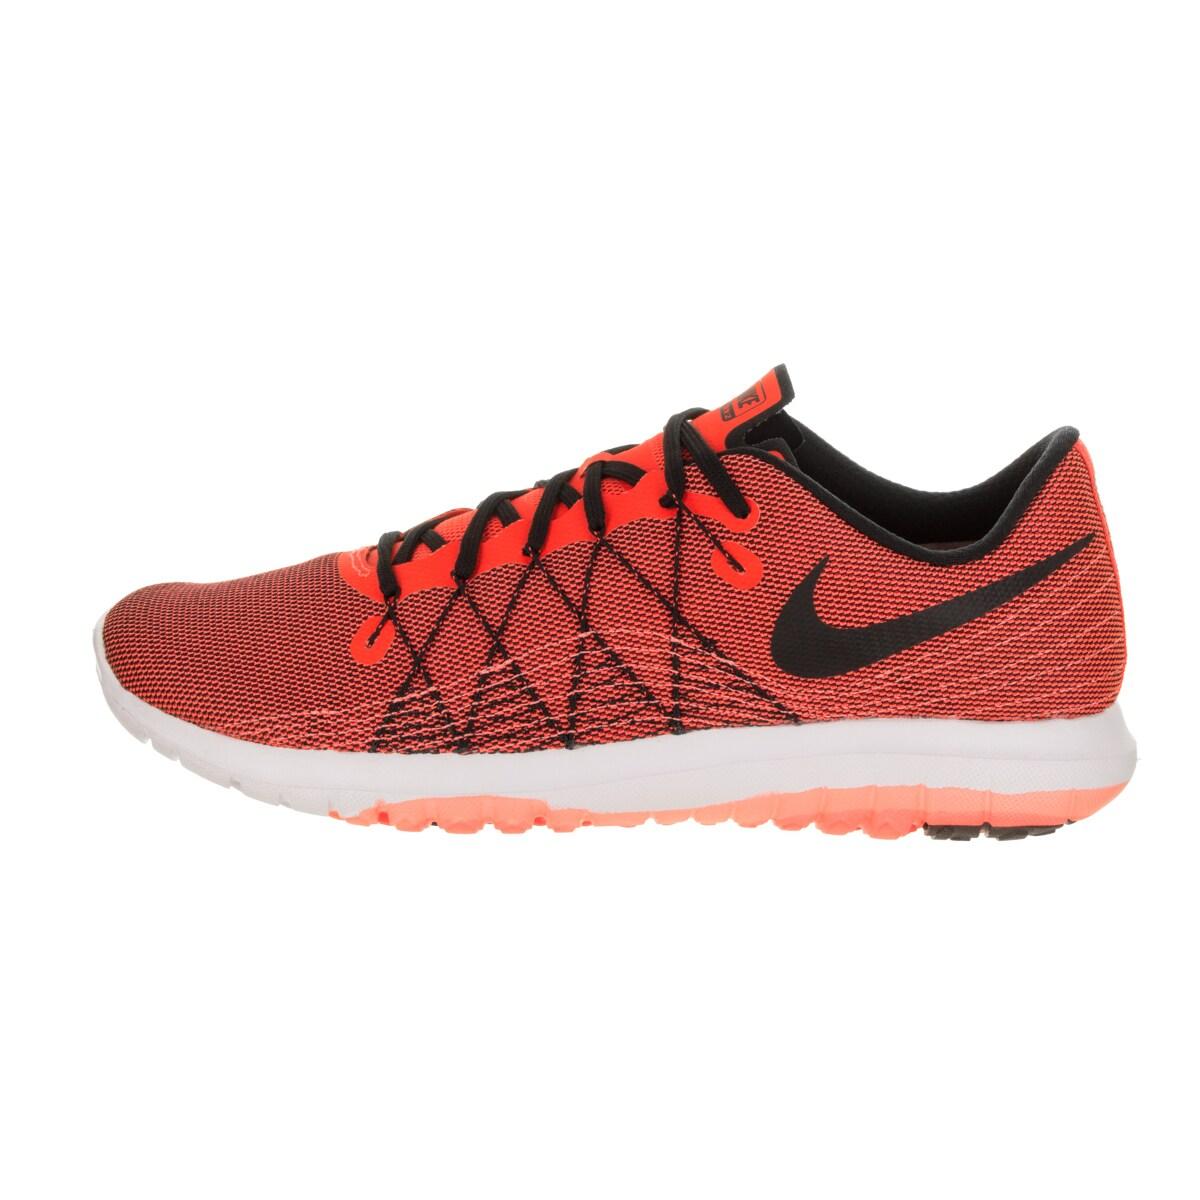 Nike Mens Flex Fury 2 Running Shoe Free Shipping Today Overstockcom 23296007